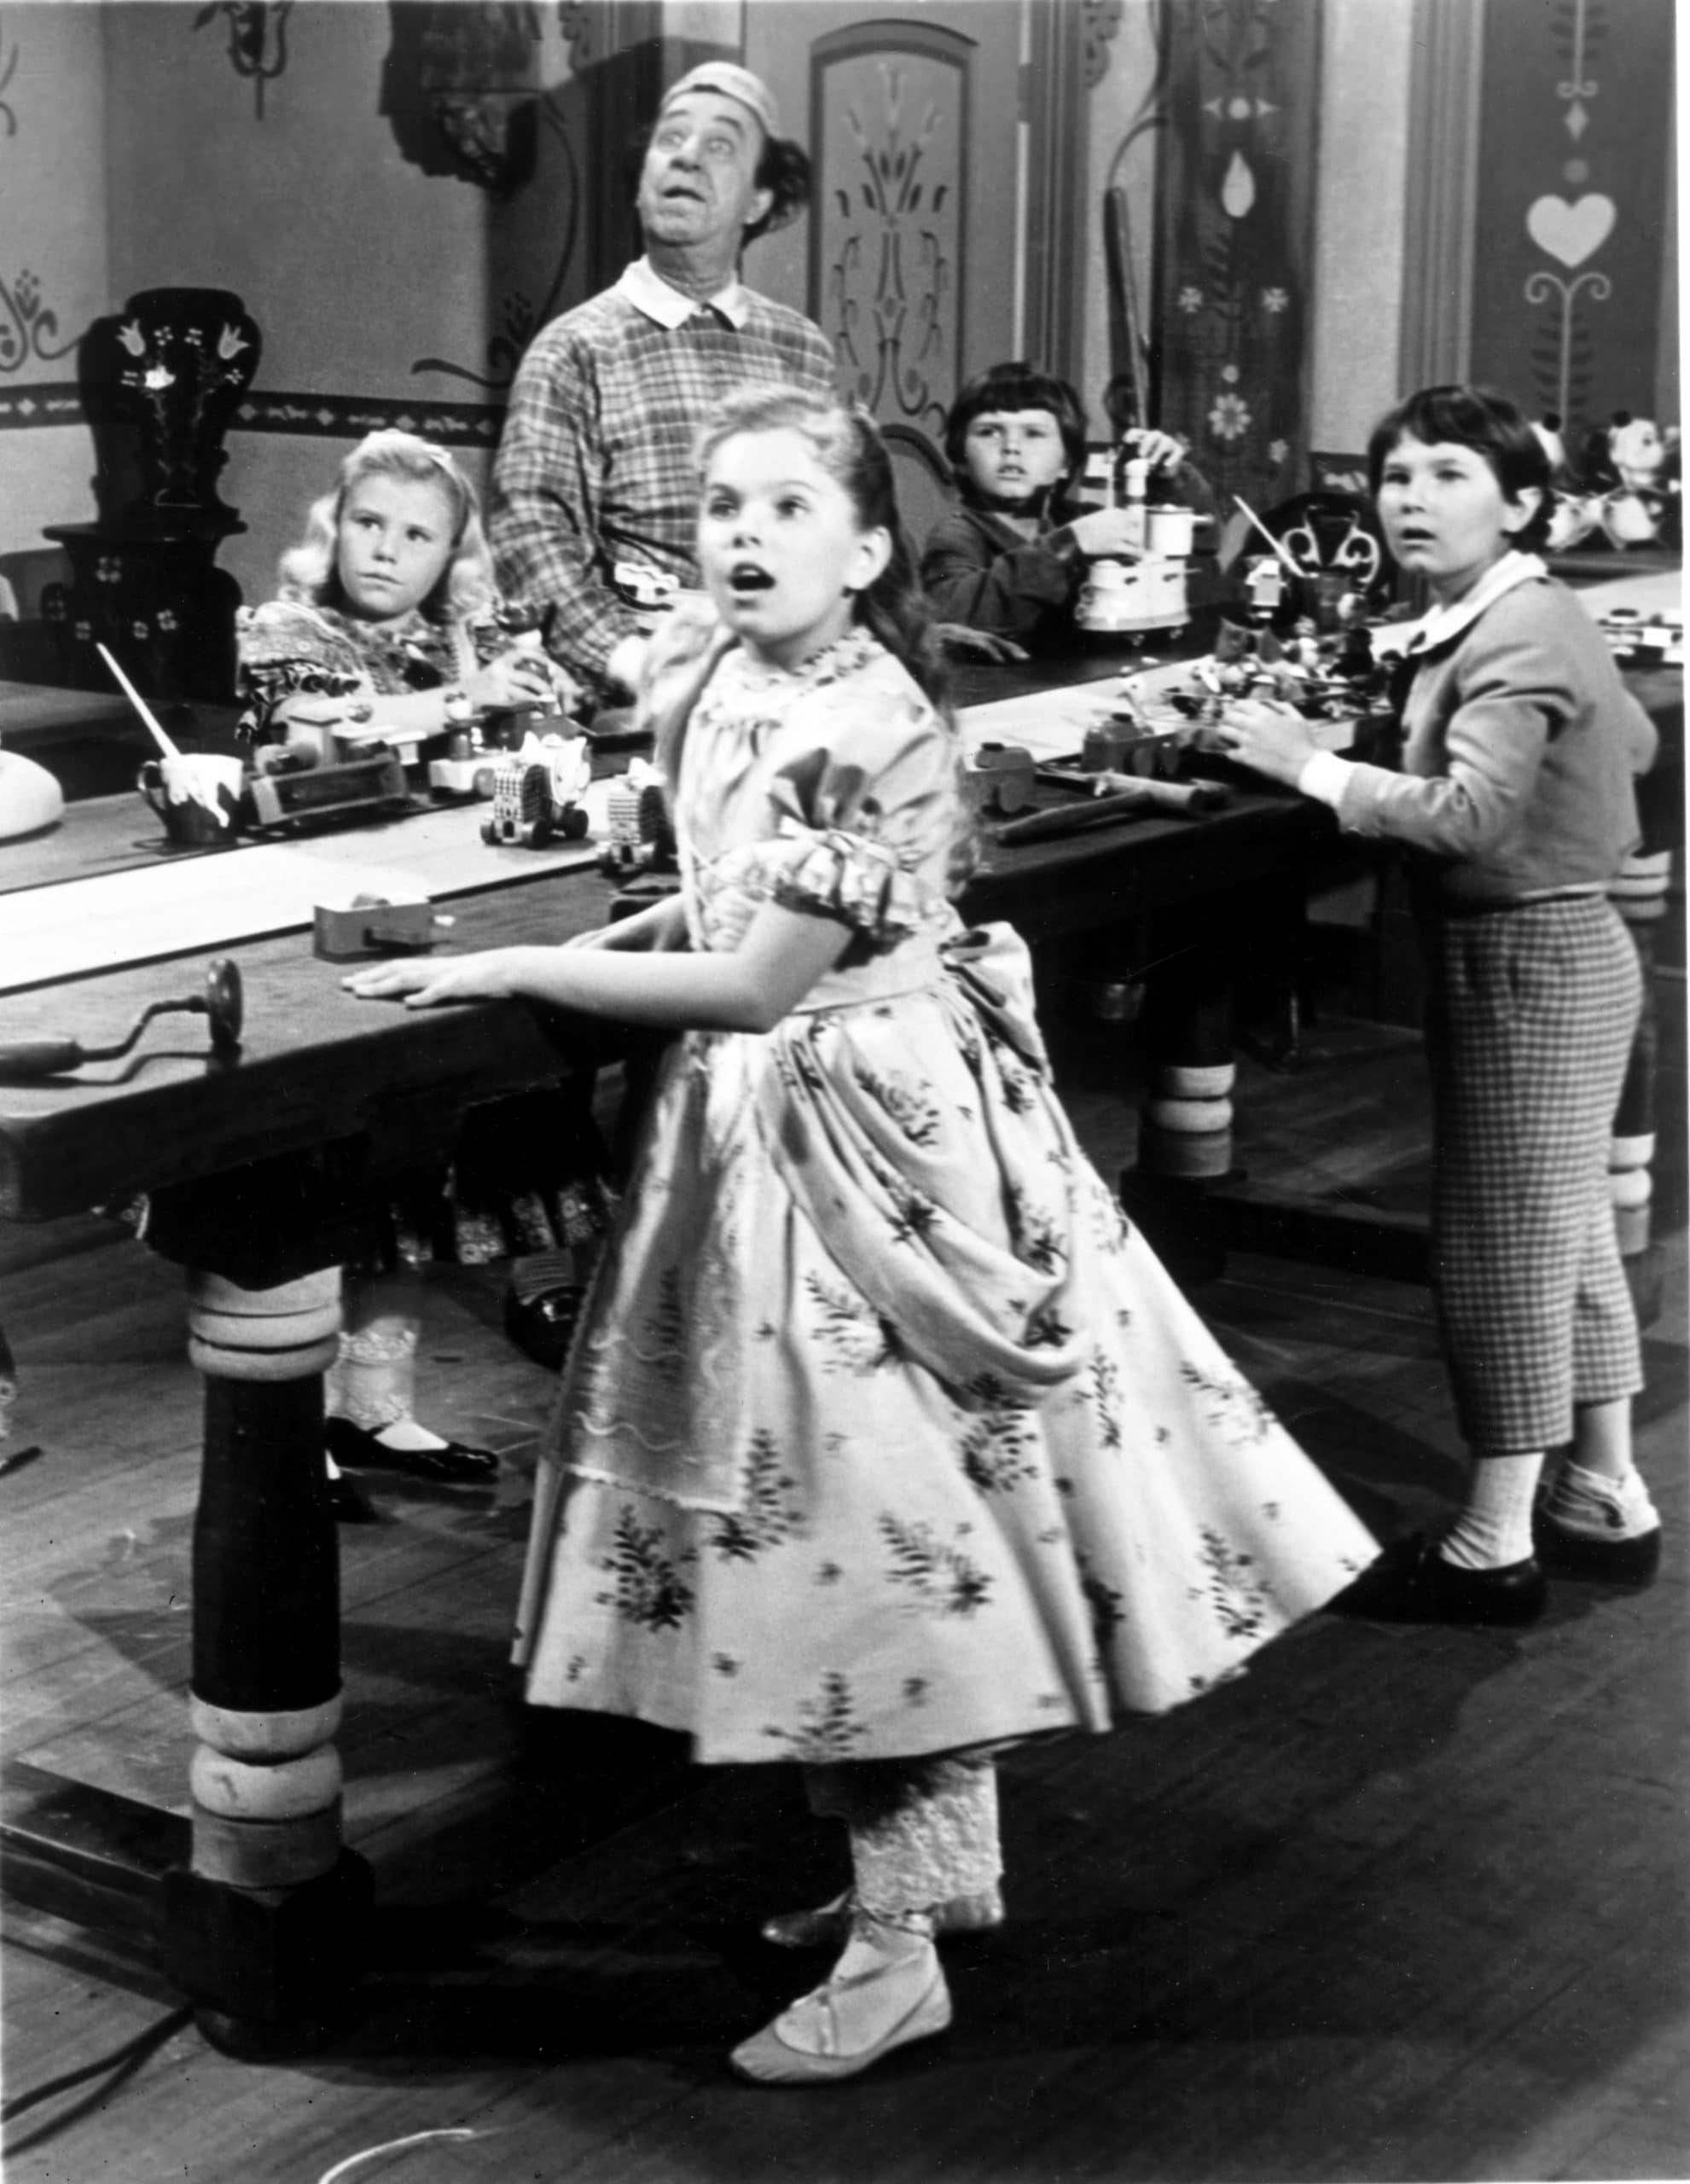 BABES IN TOYLAND, from left, front, Ann Jillian, Kevin Corcoran; back, Ed Wynn, 1961